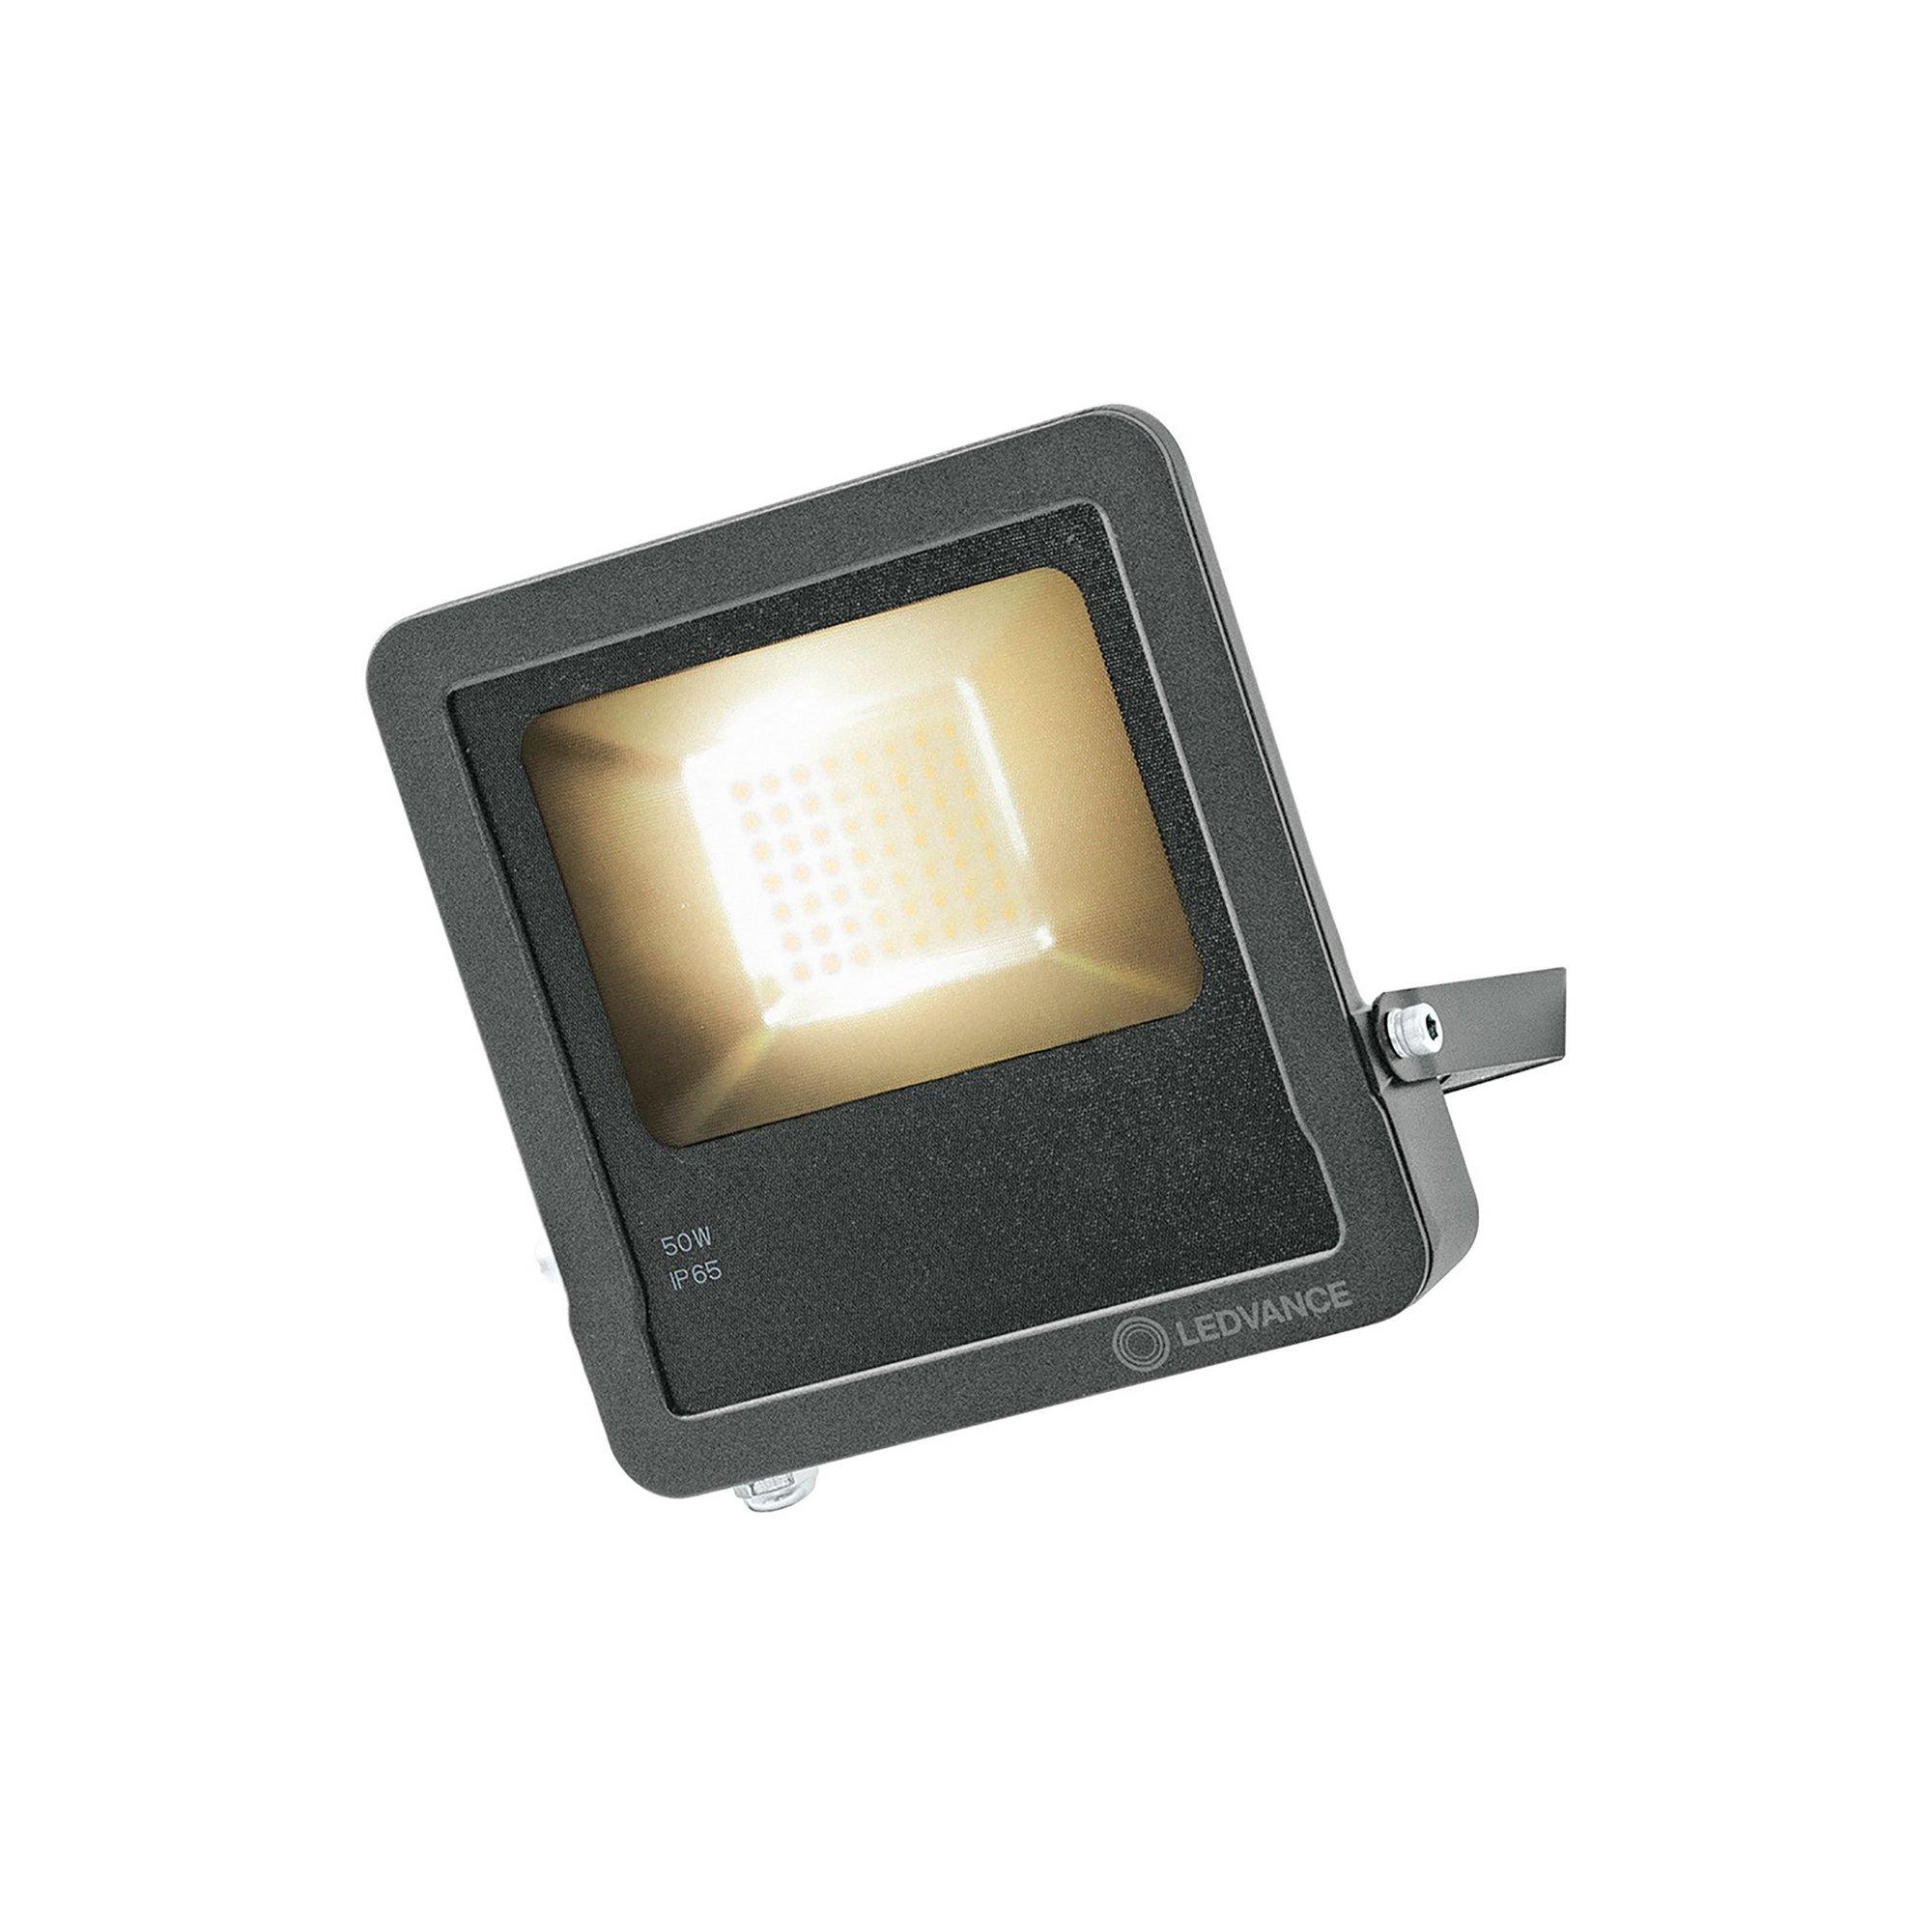 Image of Ledvance Smart+ Wi-Fi 50w Floodlight